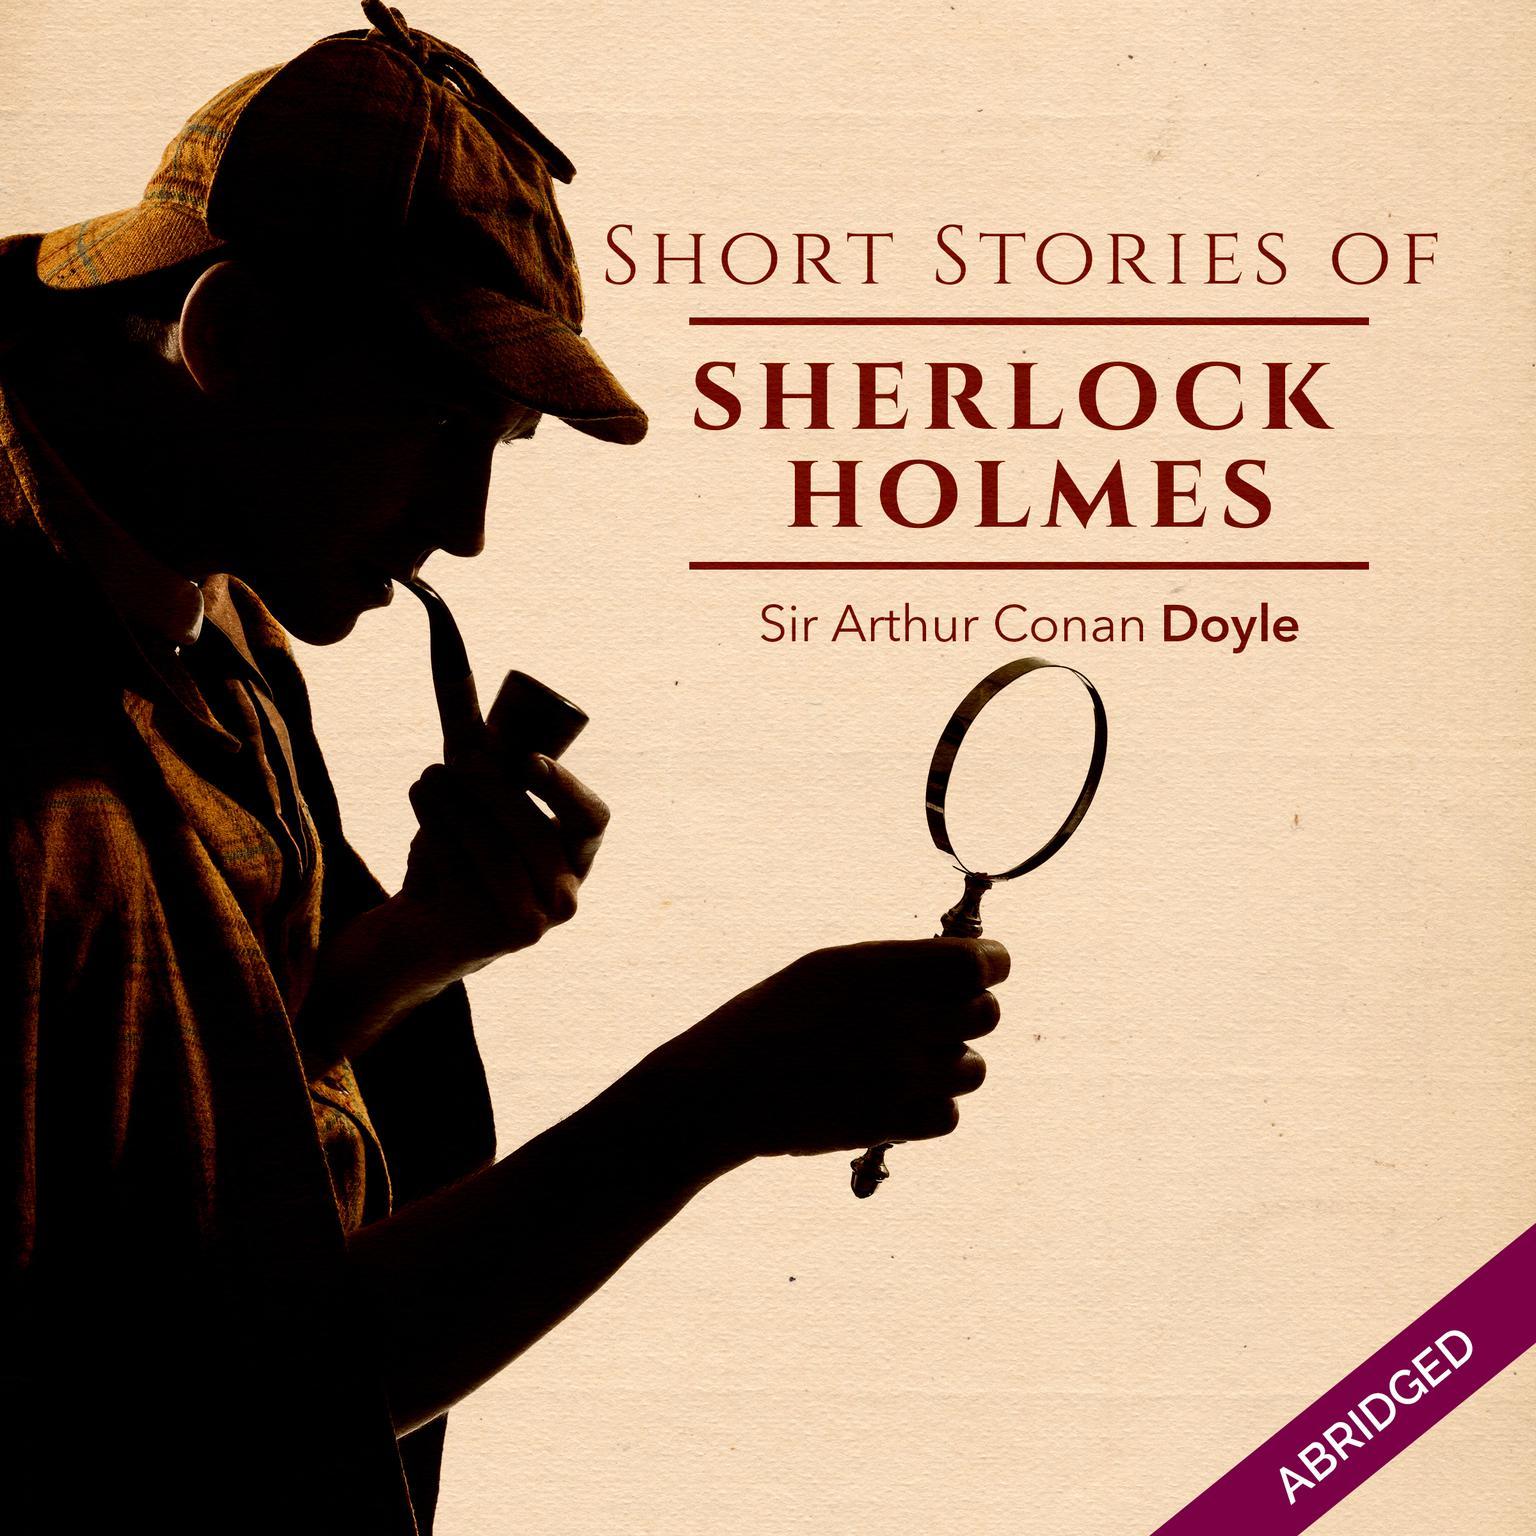 Short Stories of Sherlock Holmes Audiobook, by Arthur Conan Doyle